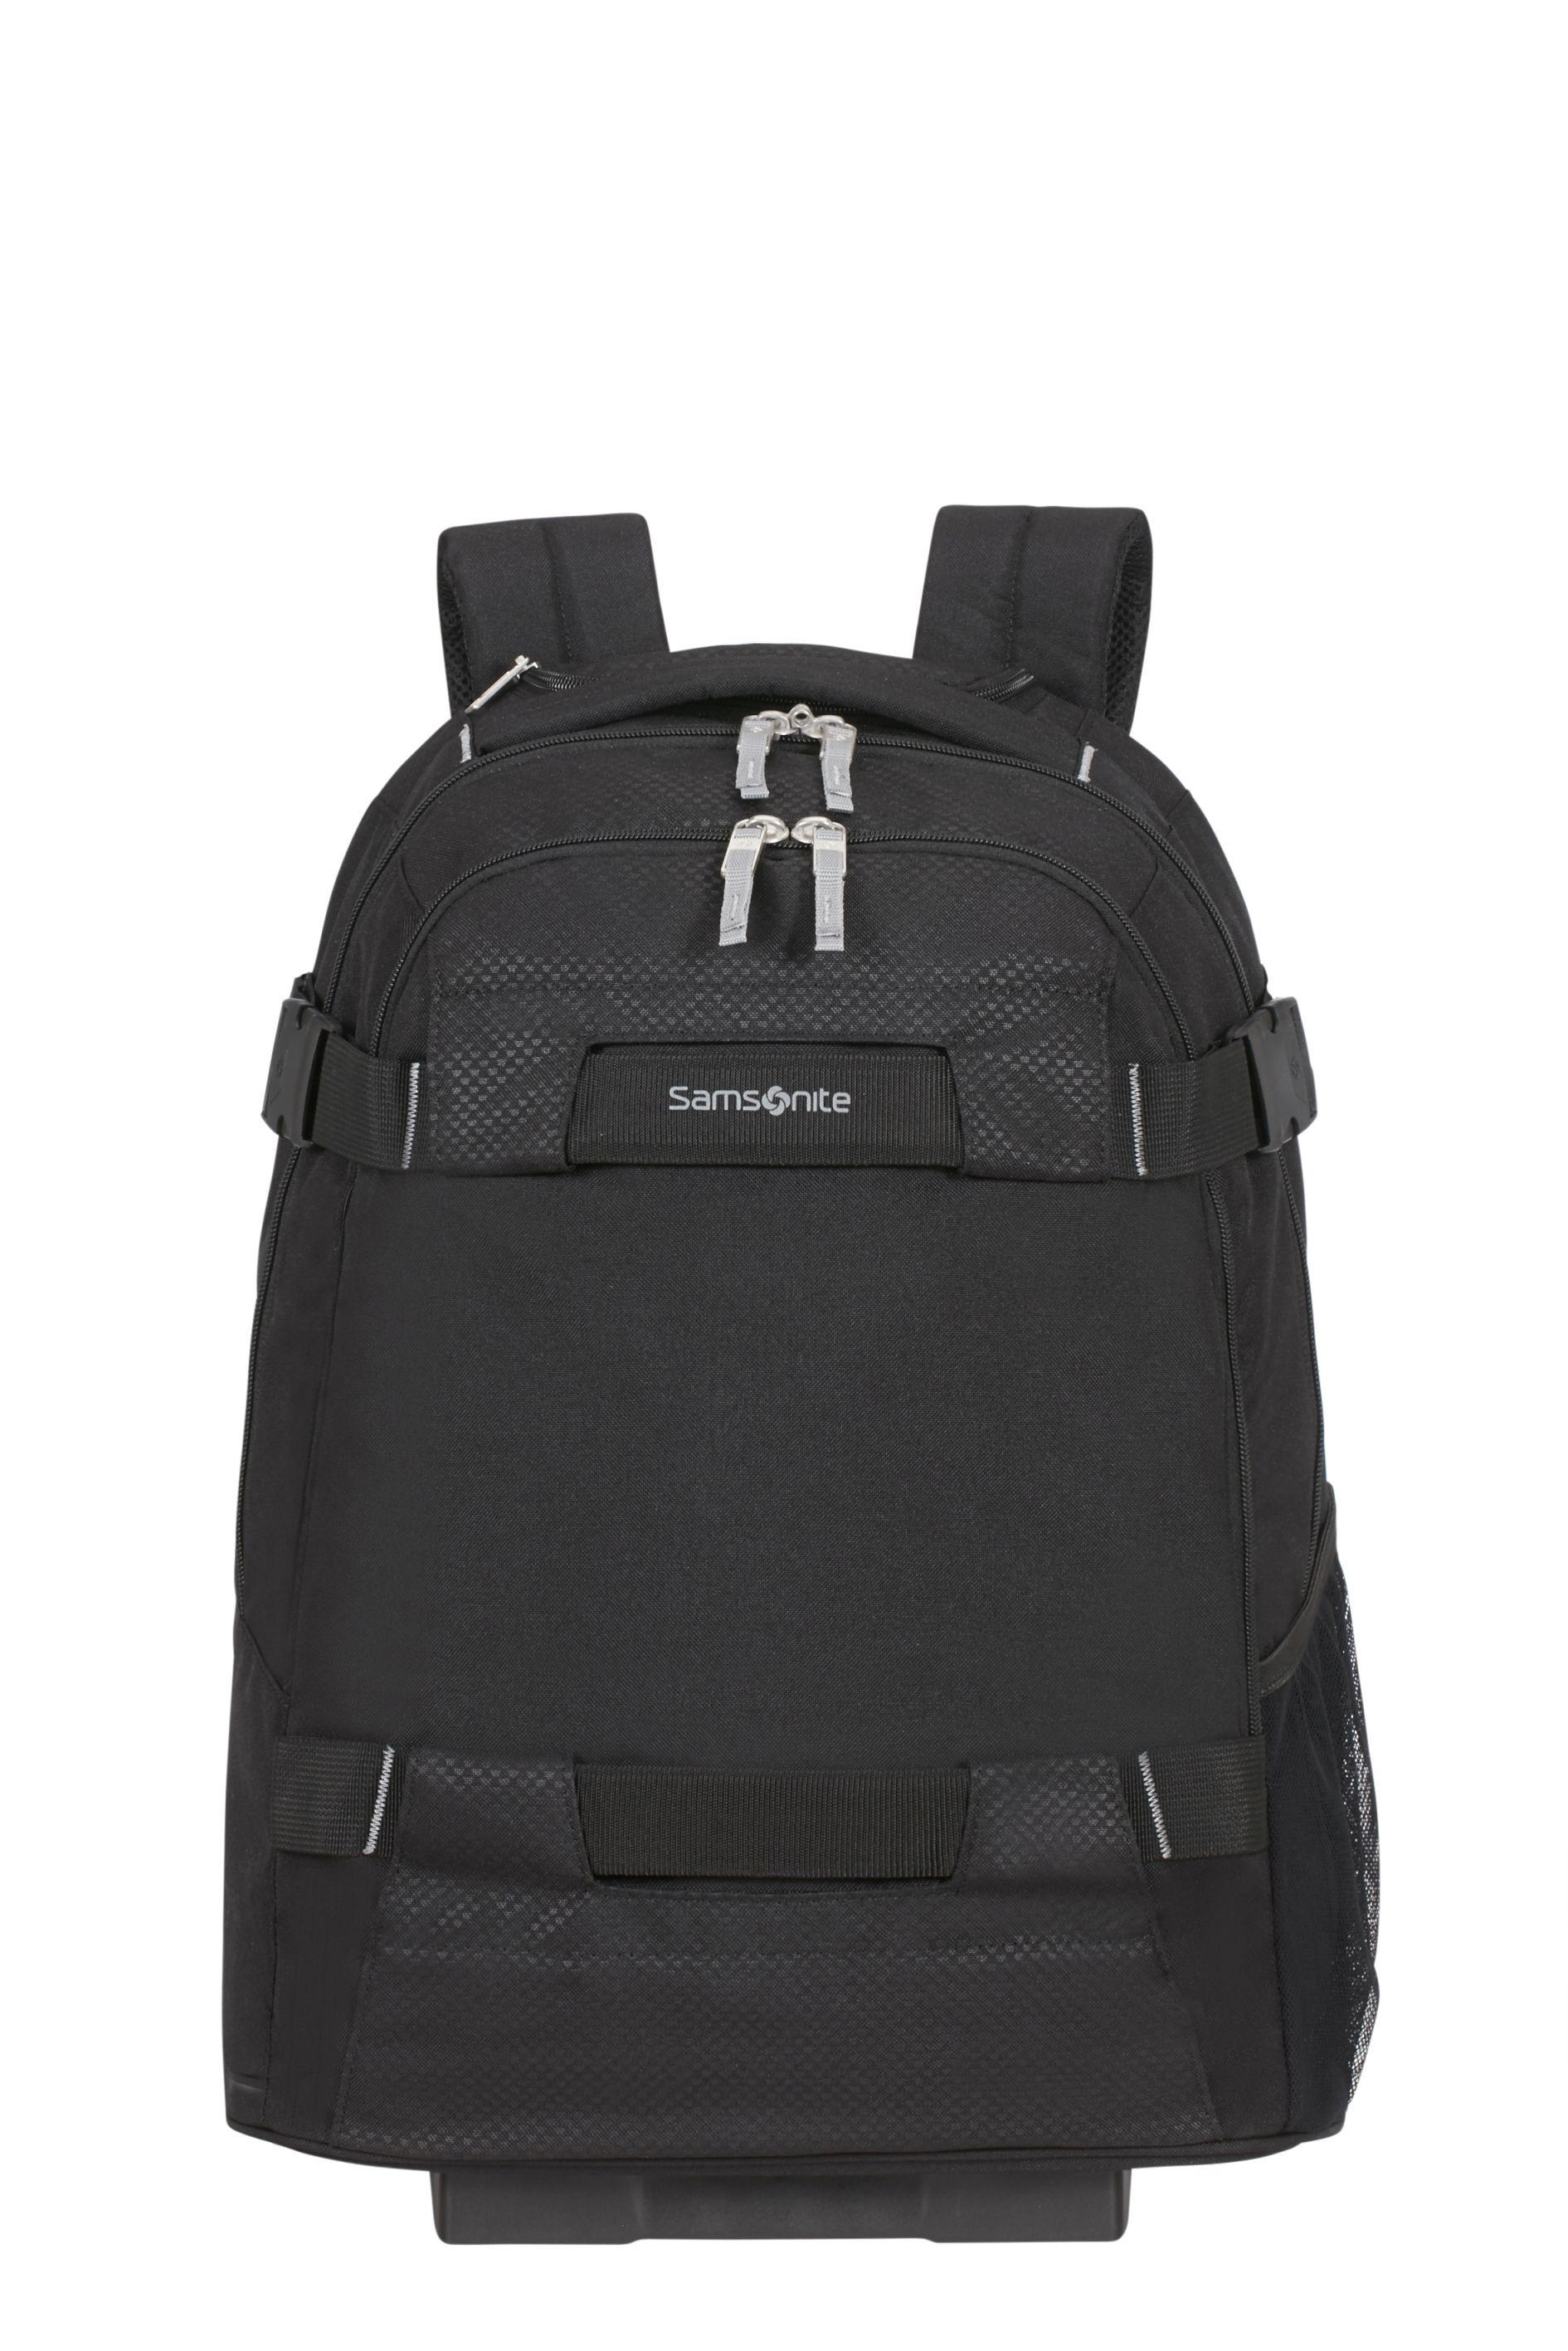 Samsonite Sonora Laptop Backpack/wh 55